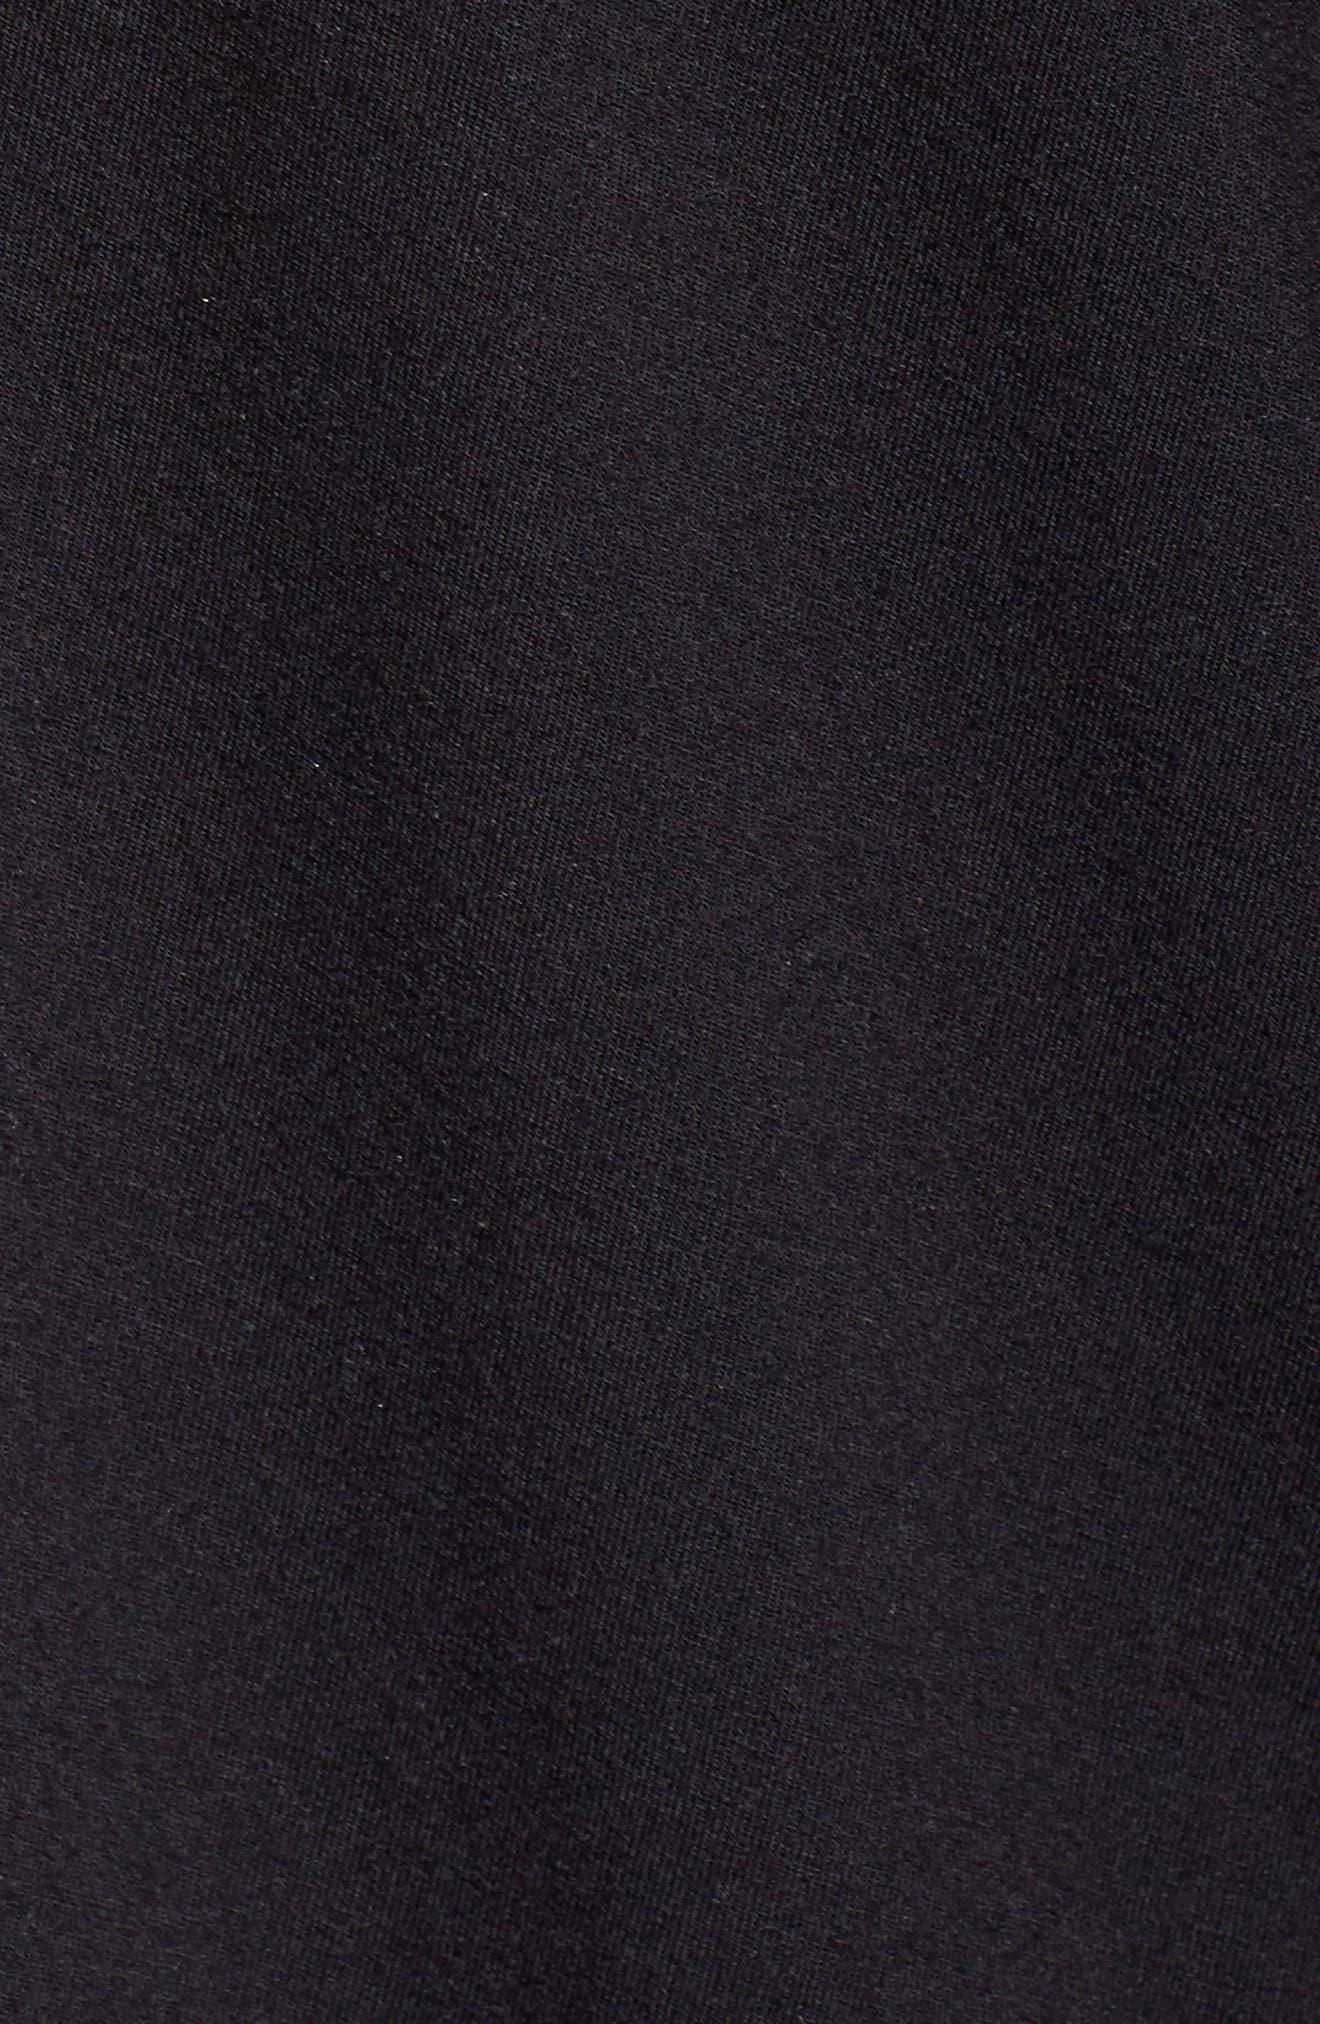 'Giselle' Pajamas,                             Alternate thumbnail 6, color,                             BLACK/ SORBET PINK